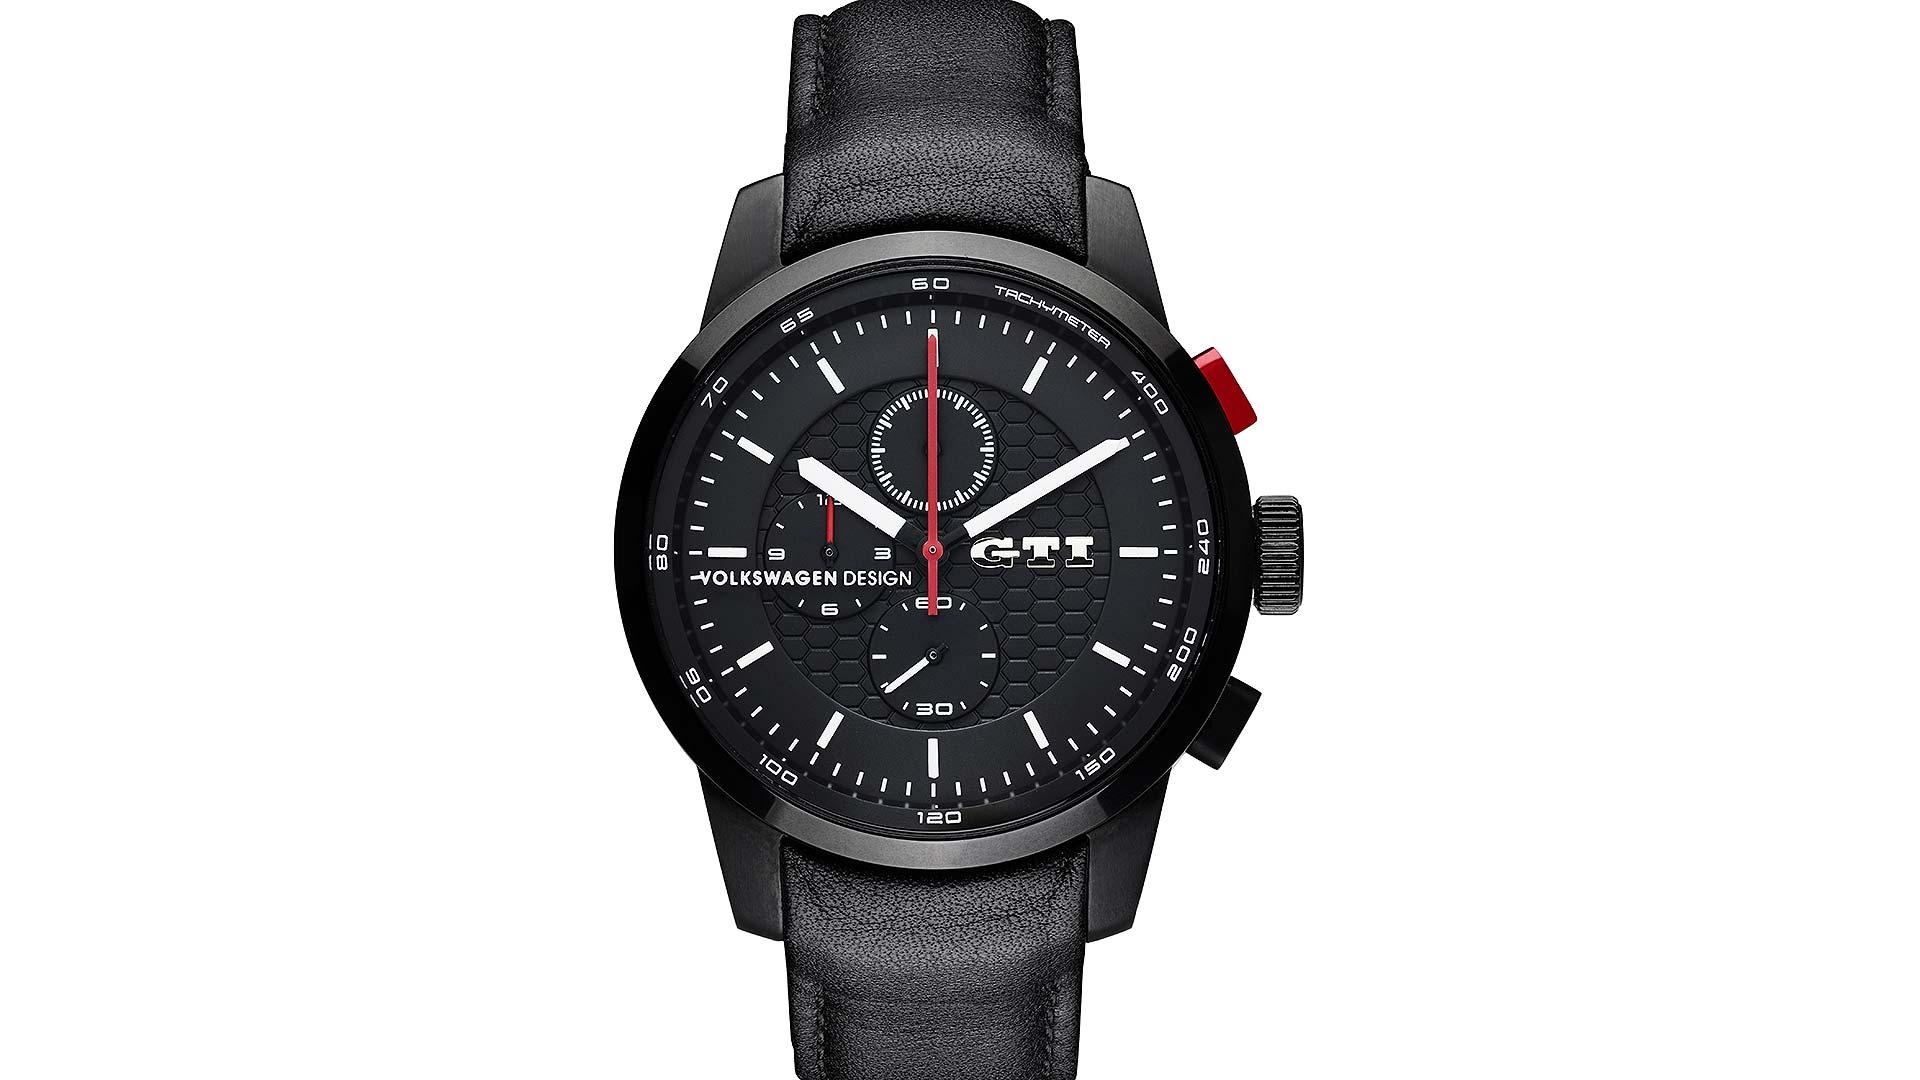 Volkswagen GTI watch